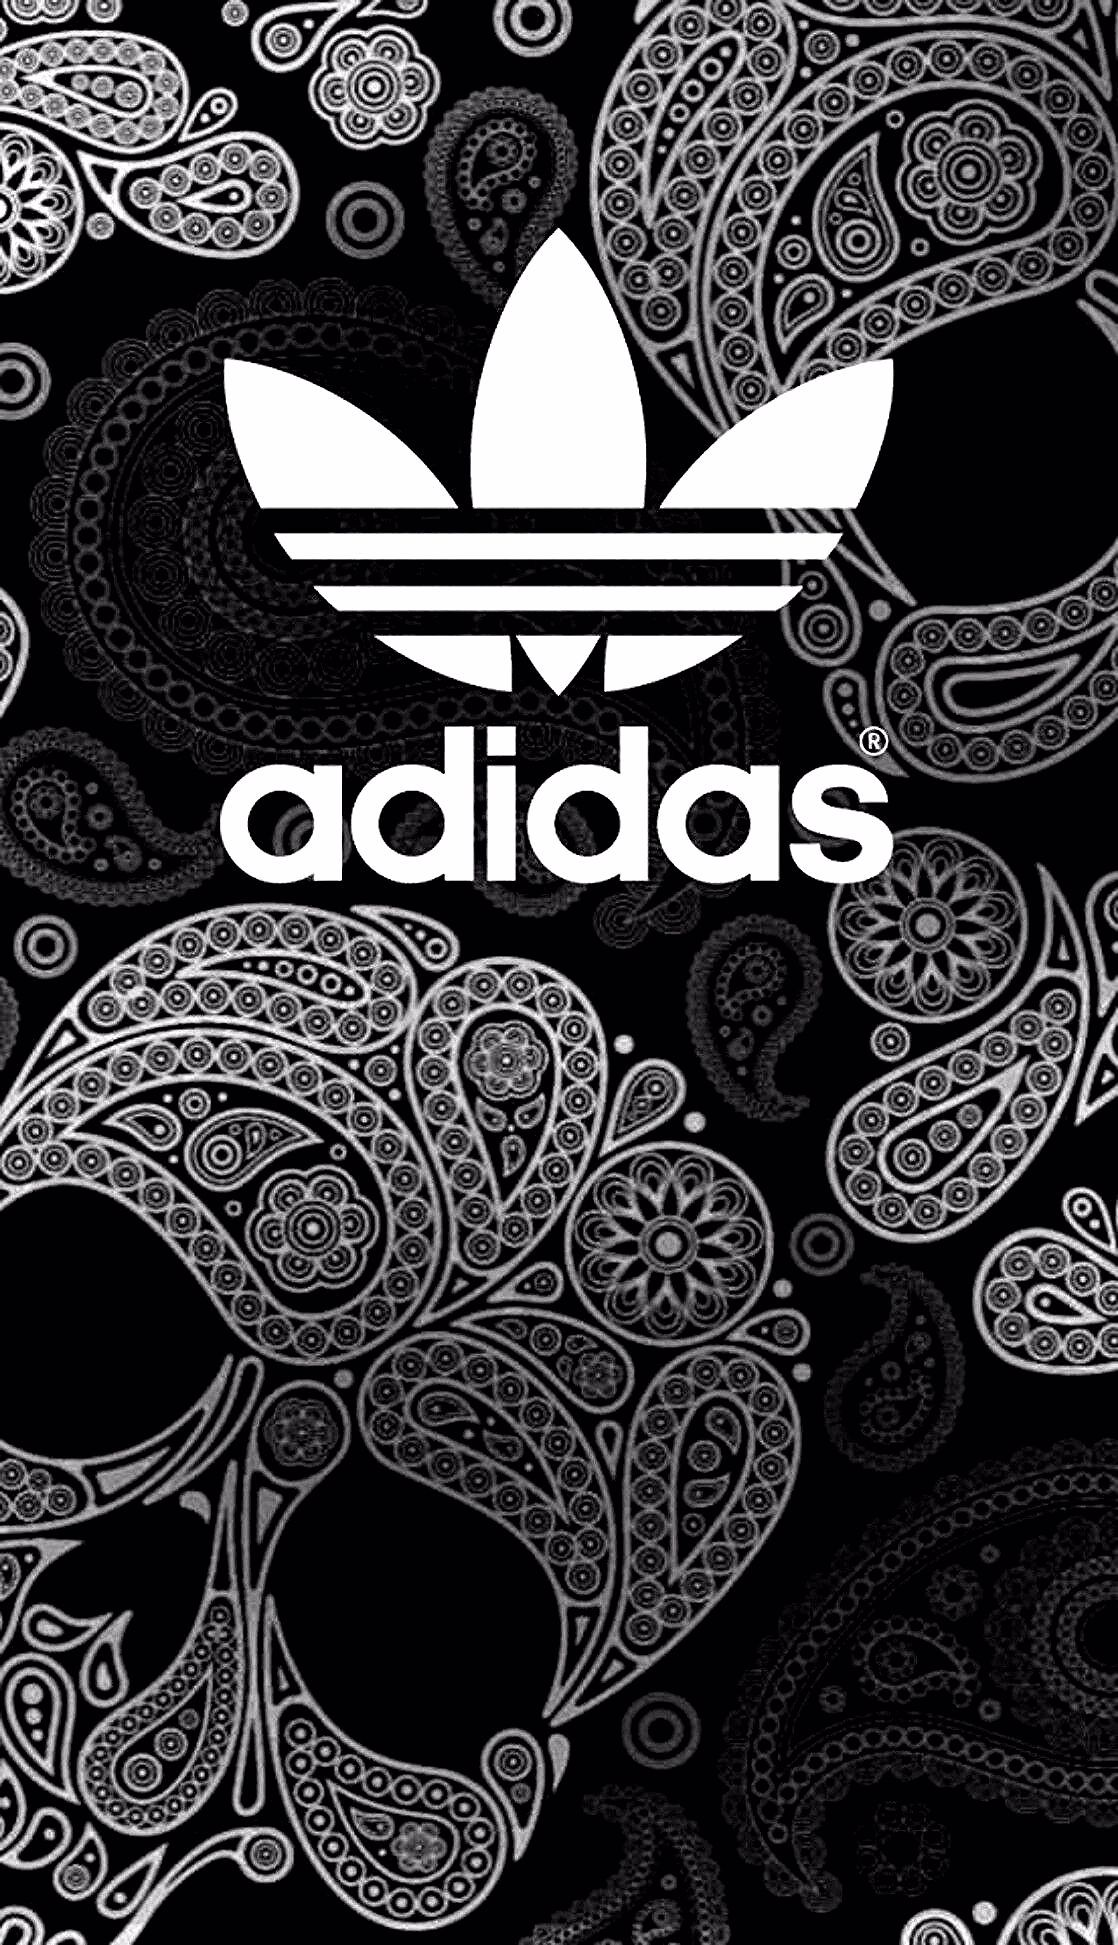 "Bild Н""¤ð""¢ð""£ð""²ð""«ð""¡ð""¢ð""« Н""žð""²ð""£ Н""‡ð""¬ Н""¦ð""± Н""¶ð""¬ð""²ð""¯ð""°ð""¢ð""©ð""£ Â""'𝔡𝔢𝔢𝔫 Adidas Logo Wallpapers Nike Wallpaper Adidas Wallpapers"